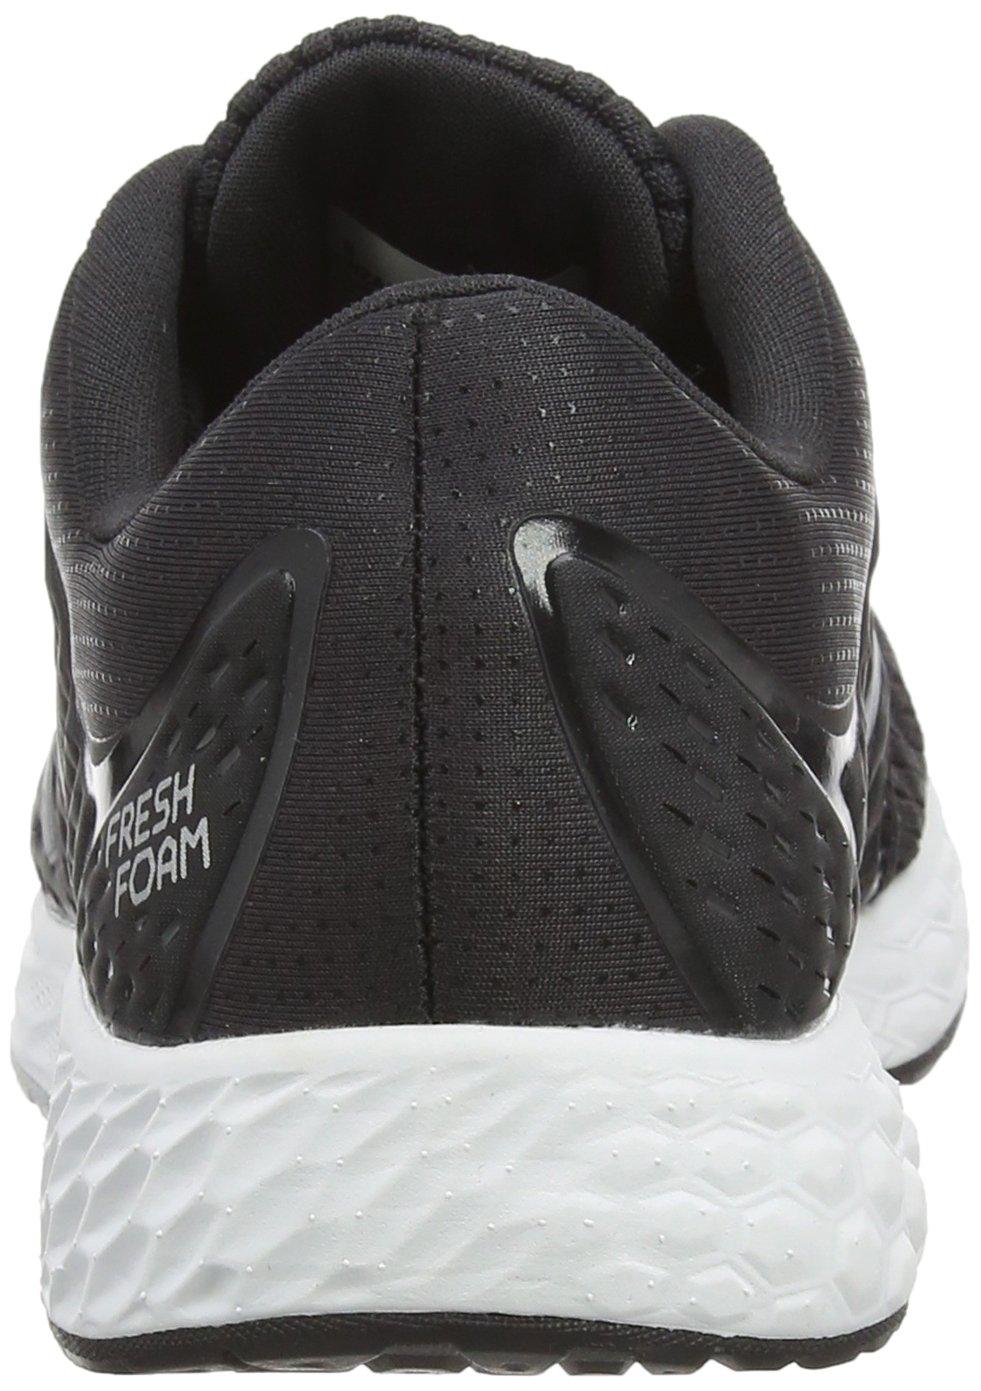 71xx9tXdEIL - New Balance Women's Fresh Foam Zante V4 Neutral Running Shoes